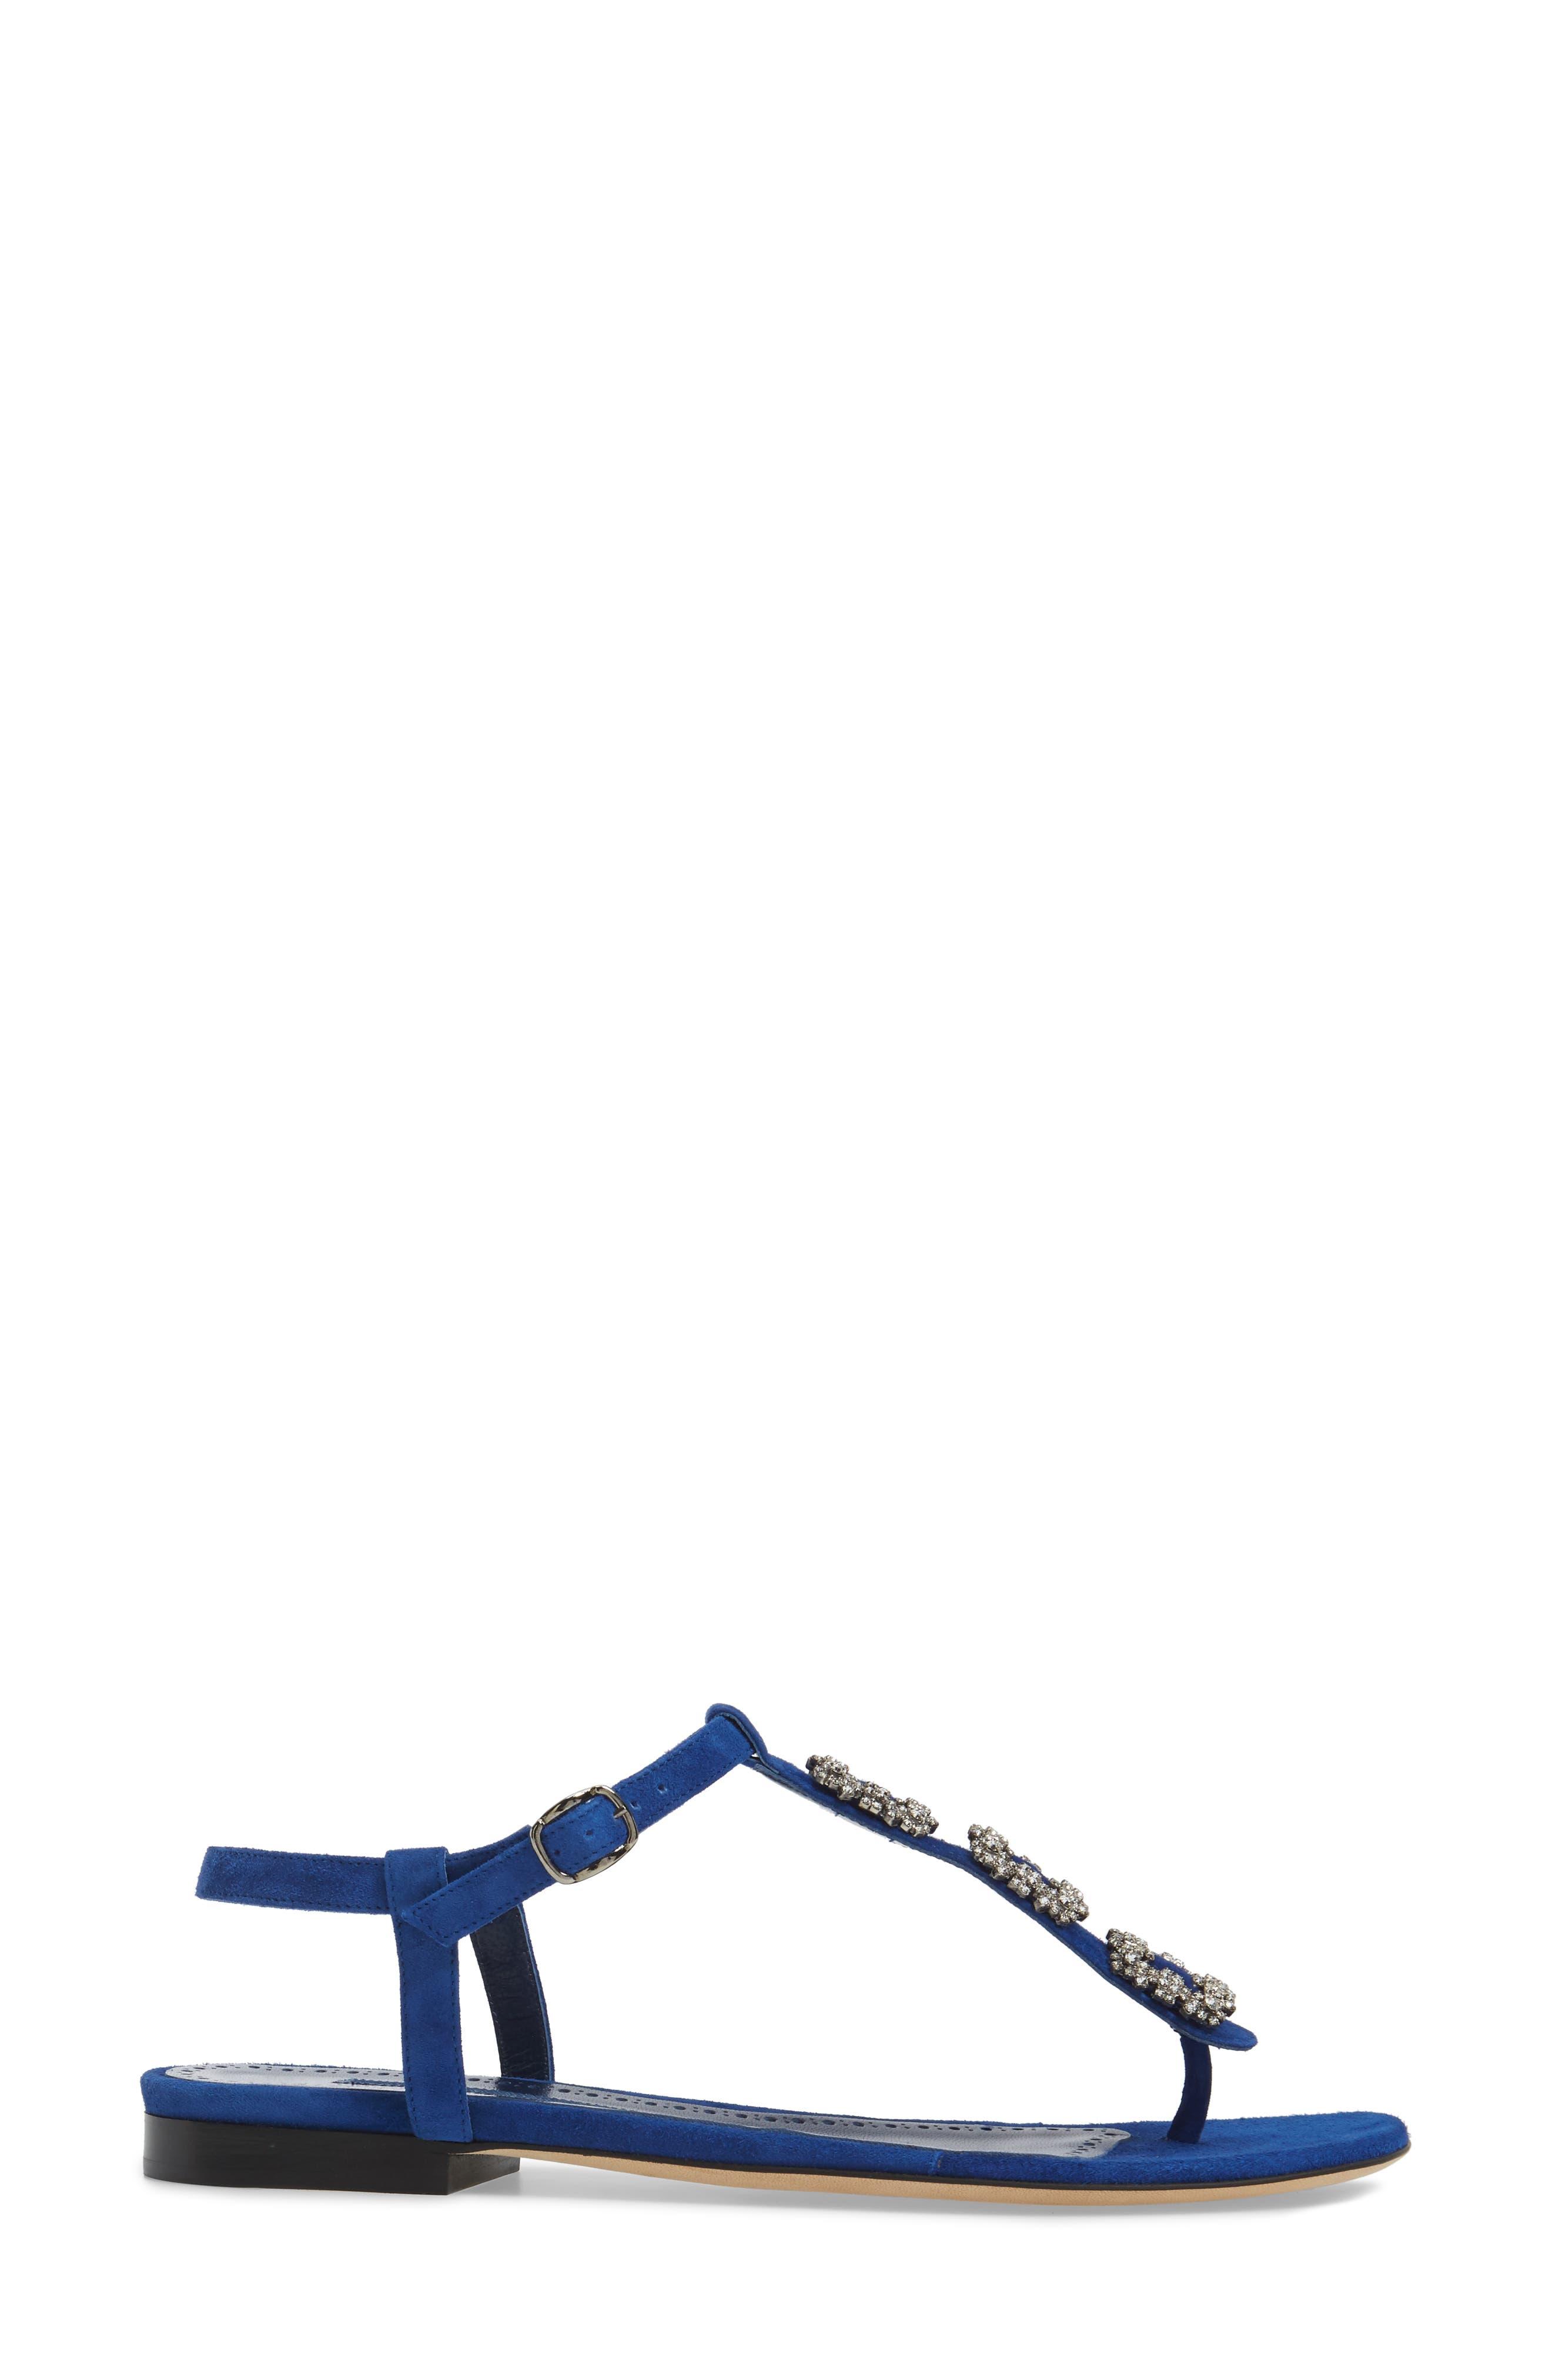 Ottolina T-Strap Sandal,                             Alternate thumbnail 3, color,                             Blue Suede